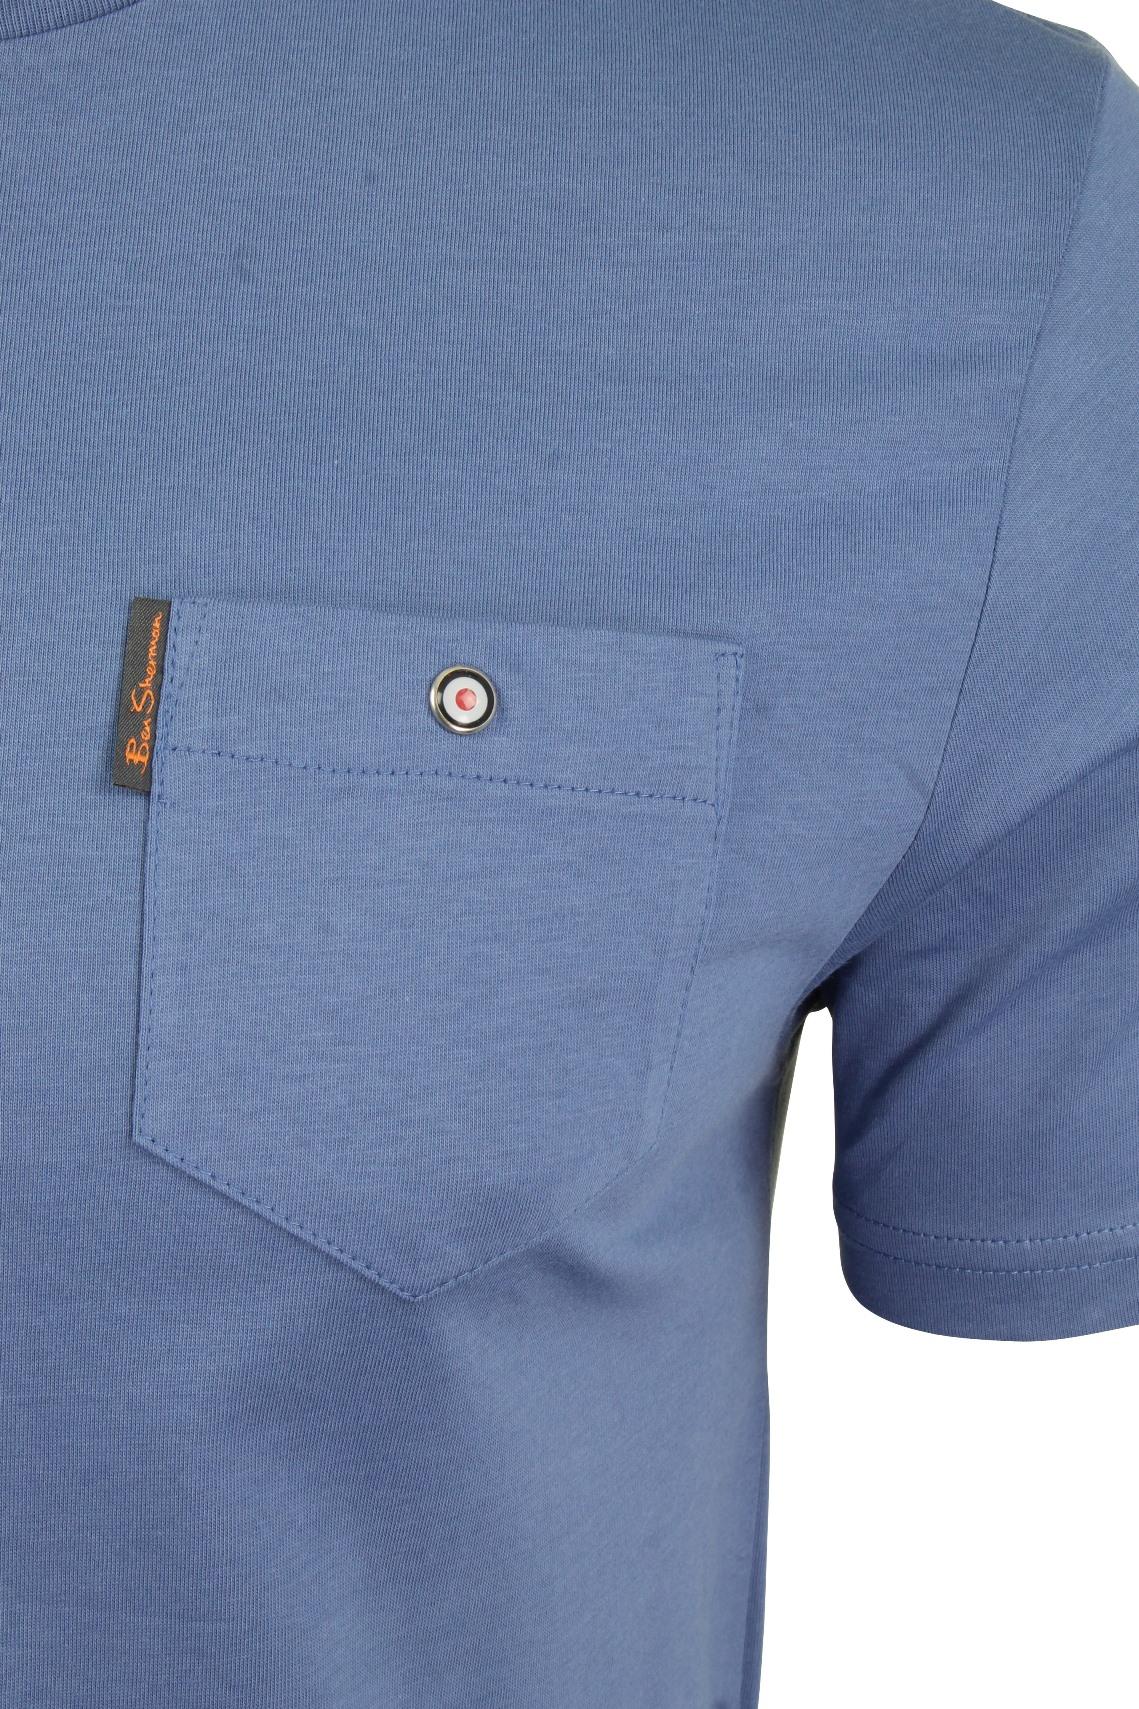 Mens-Classic-Spade-Pocket-T-Shirt-by-Ben-Sherman thumbnail 18